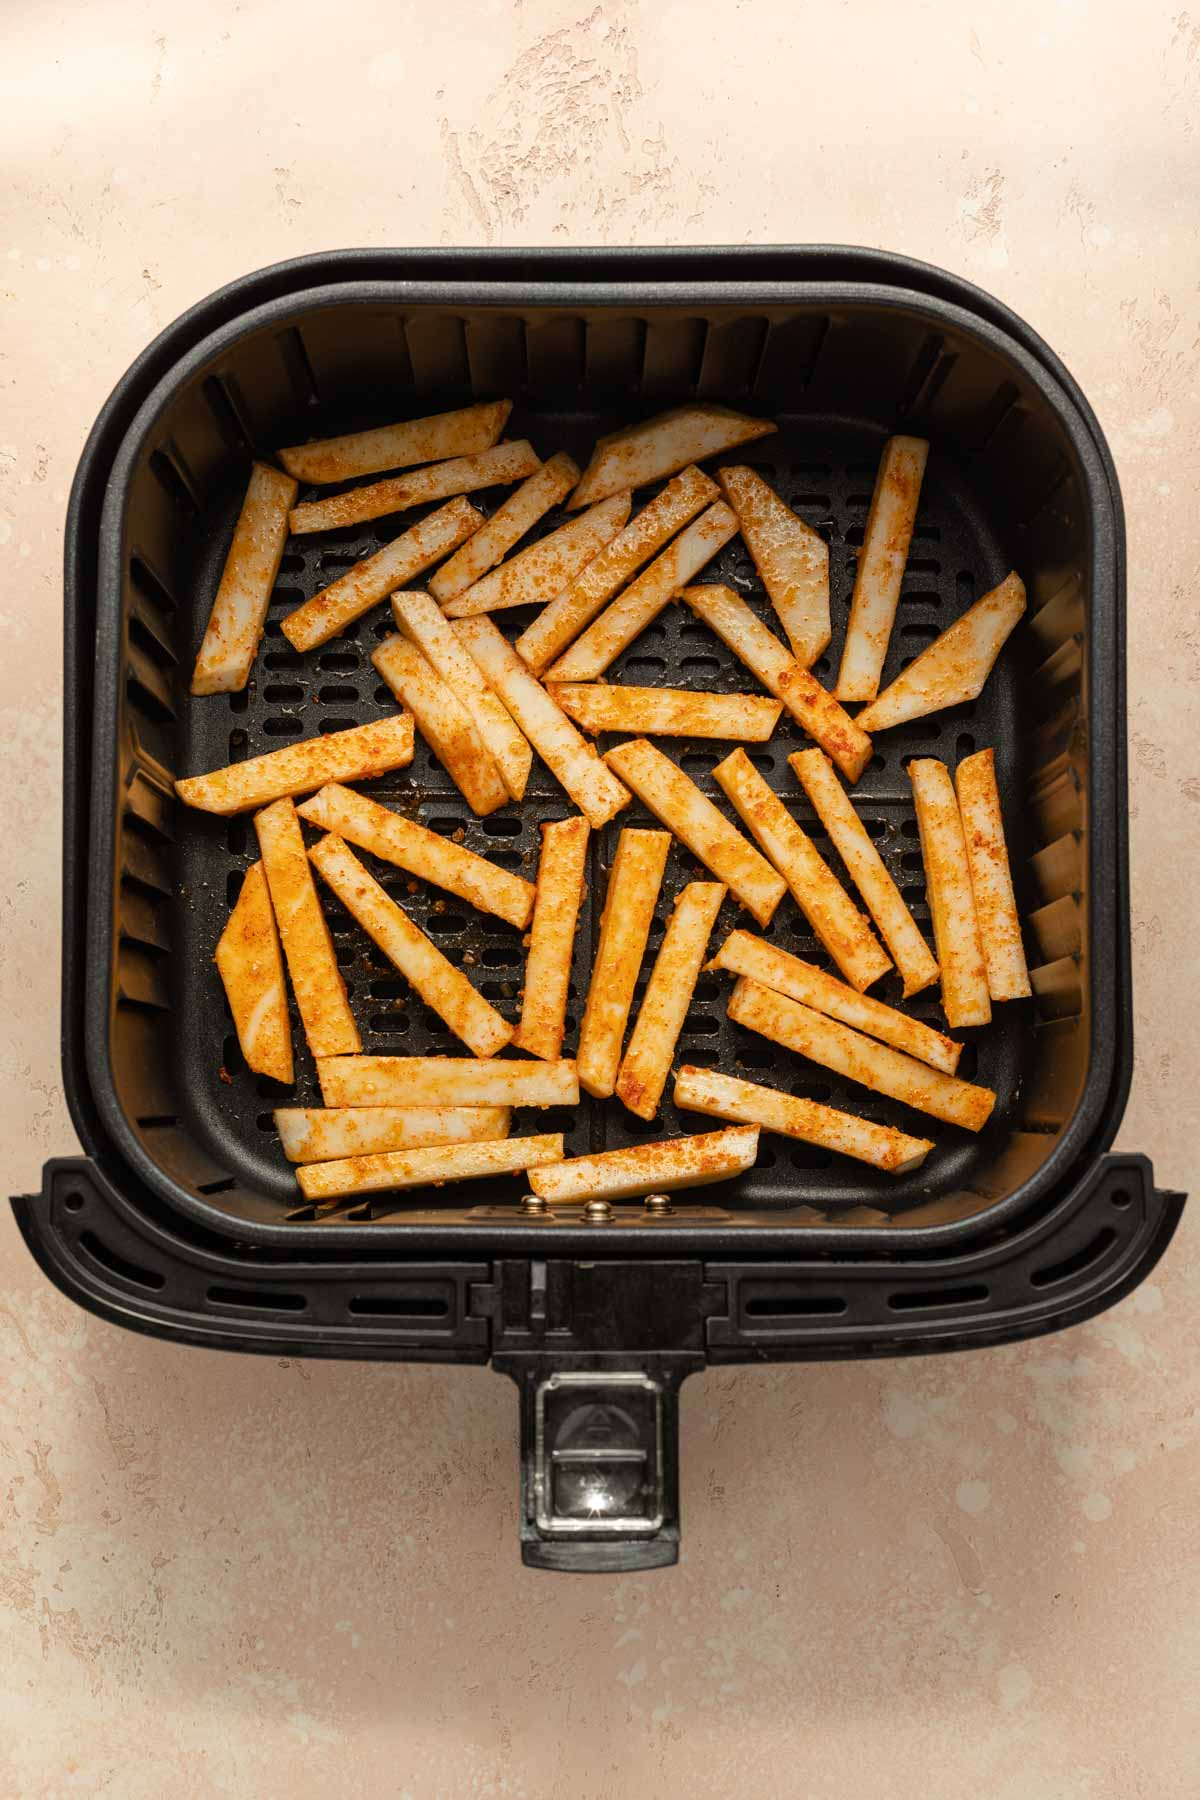 Seasoned raw turnip fries arranged in a single layer in an air fryer basket.